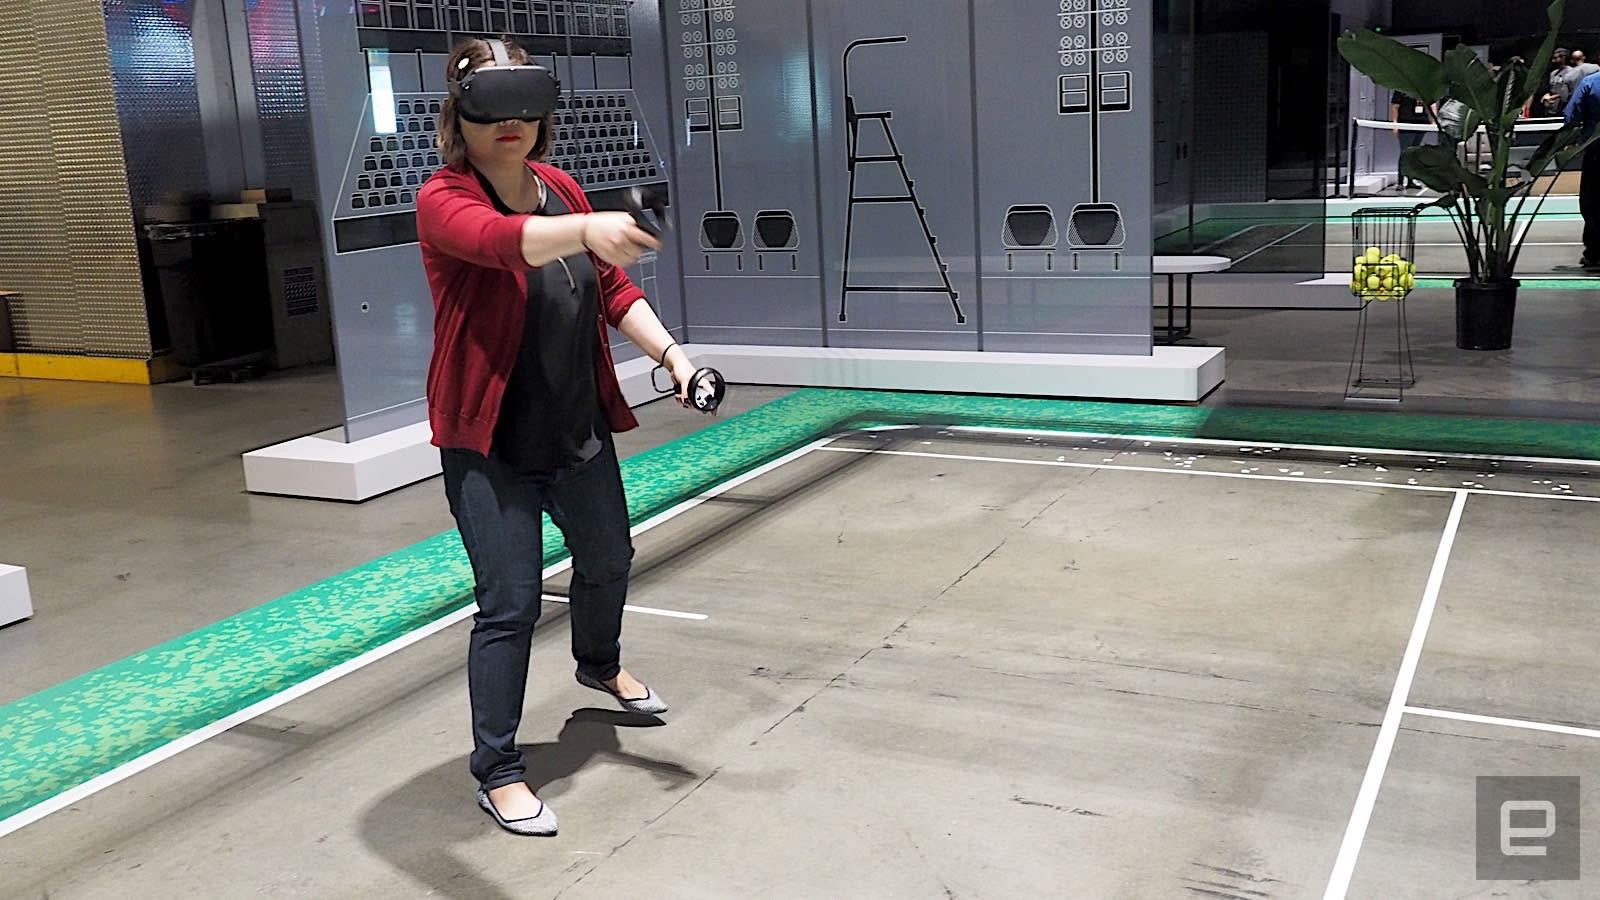 Oculus Quest hands-on